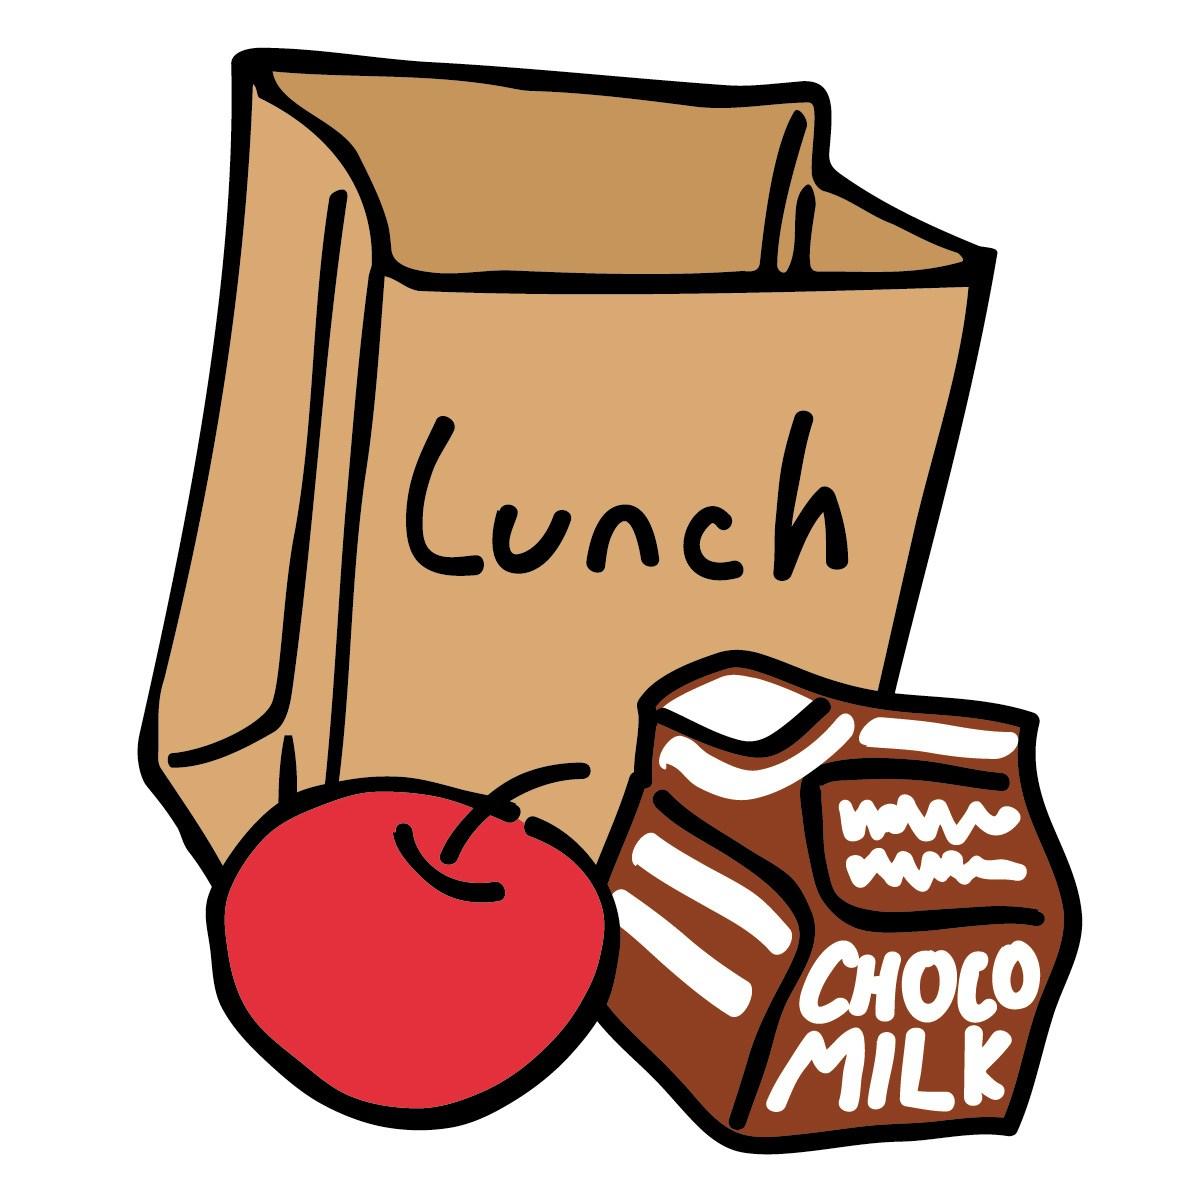 Lunch date clipart 6 » Clipart Portal.